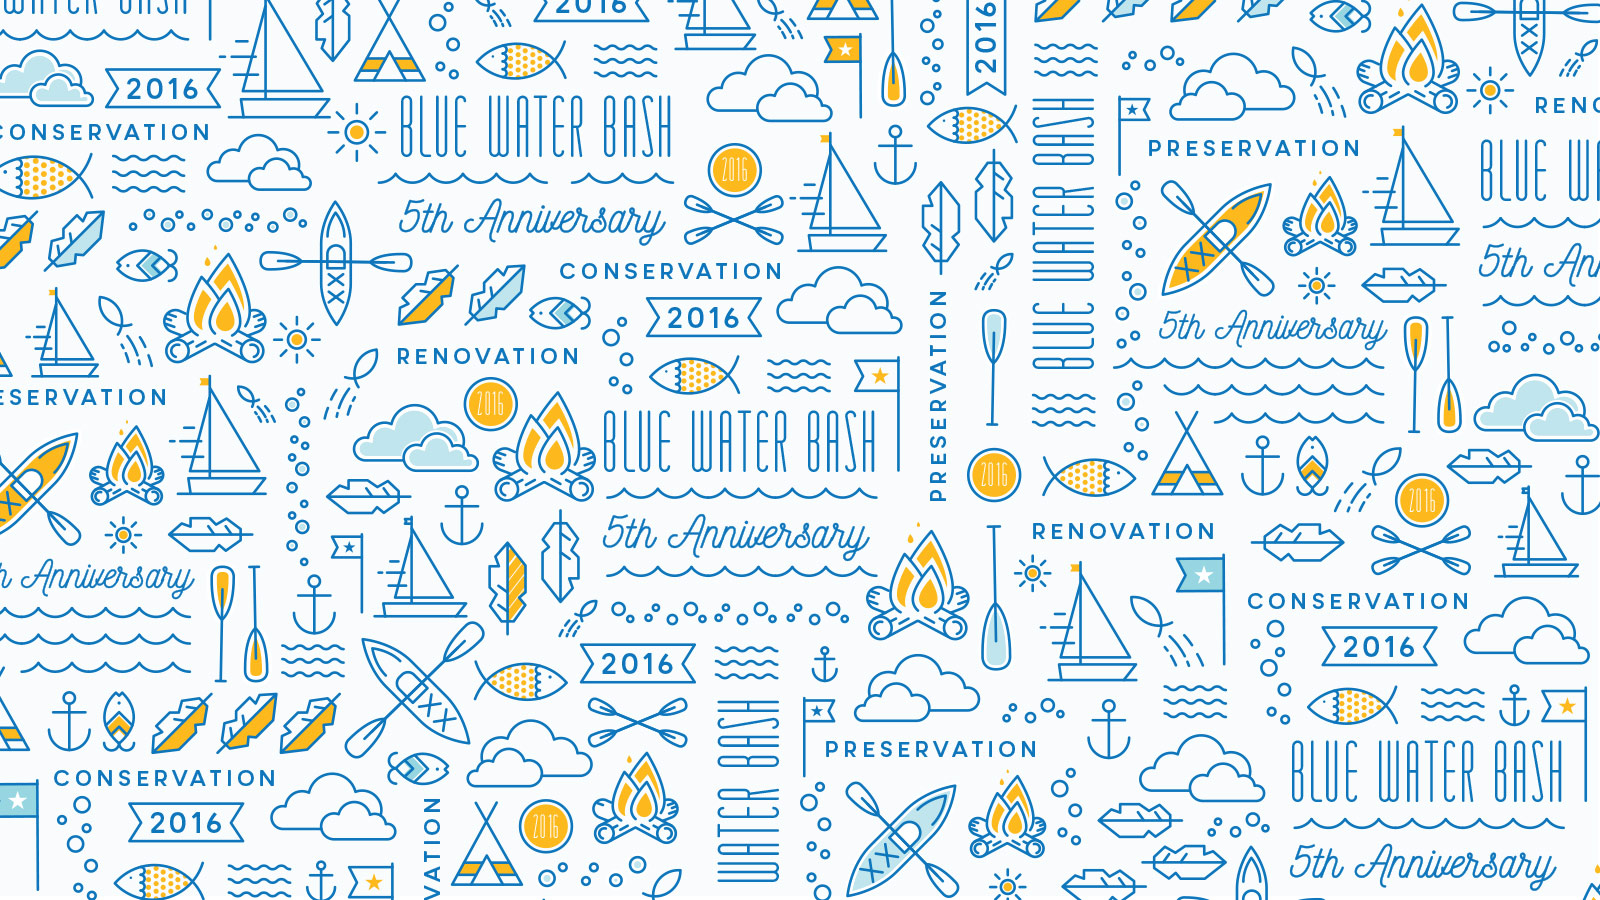 Boys Town Blue Water Bash Pattern